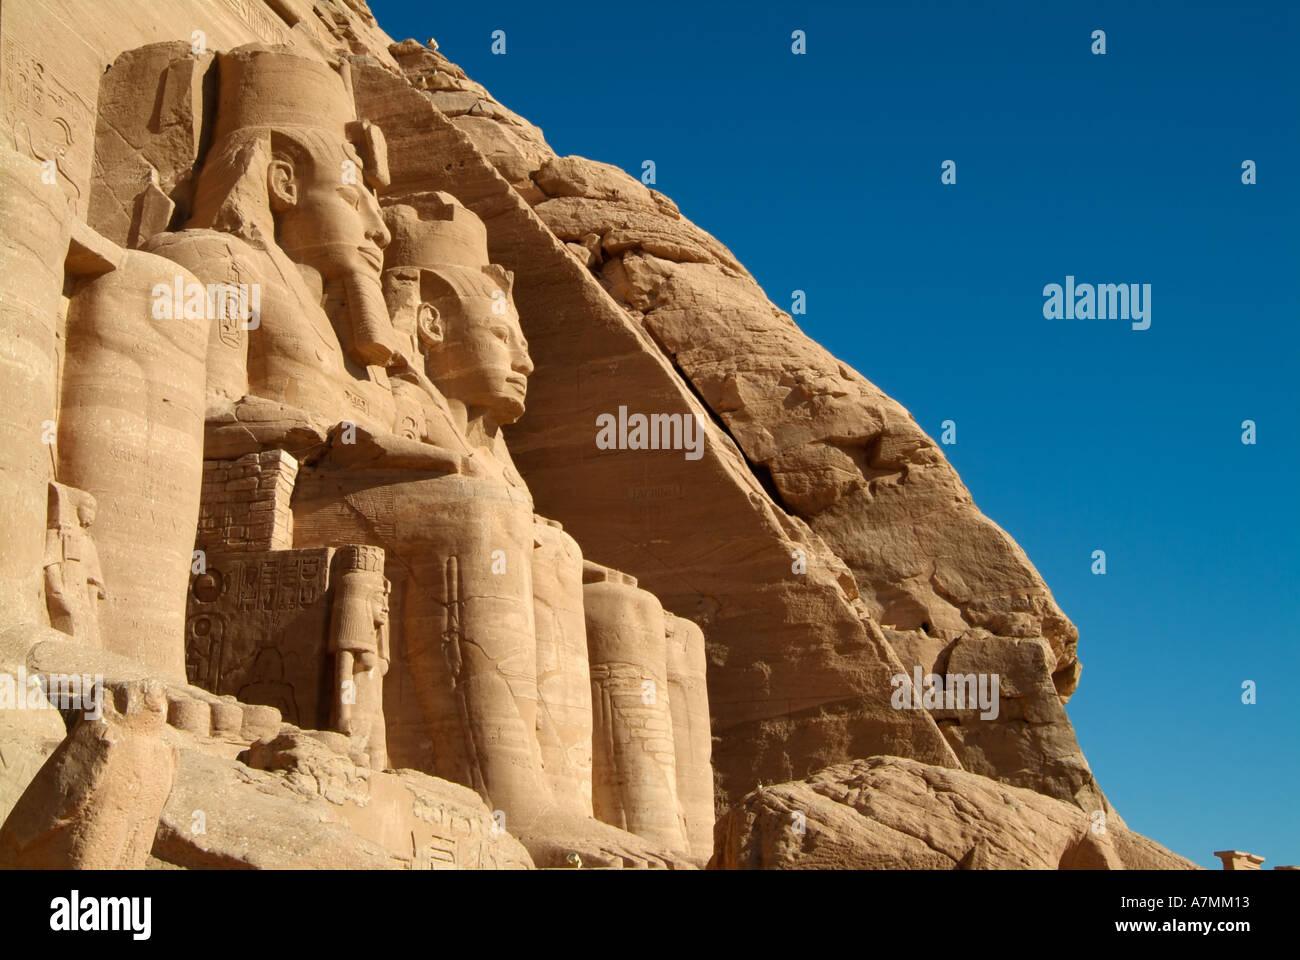 Colossal statues of Ramses II at Abu Simbel, Egypt - Stock Image